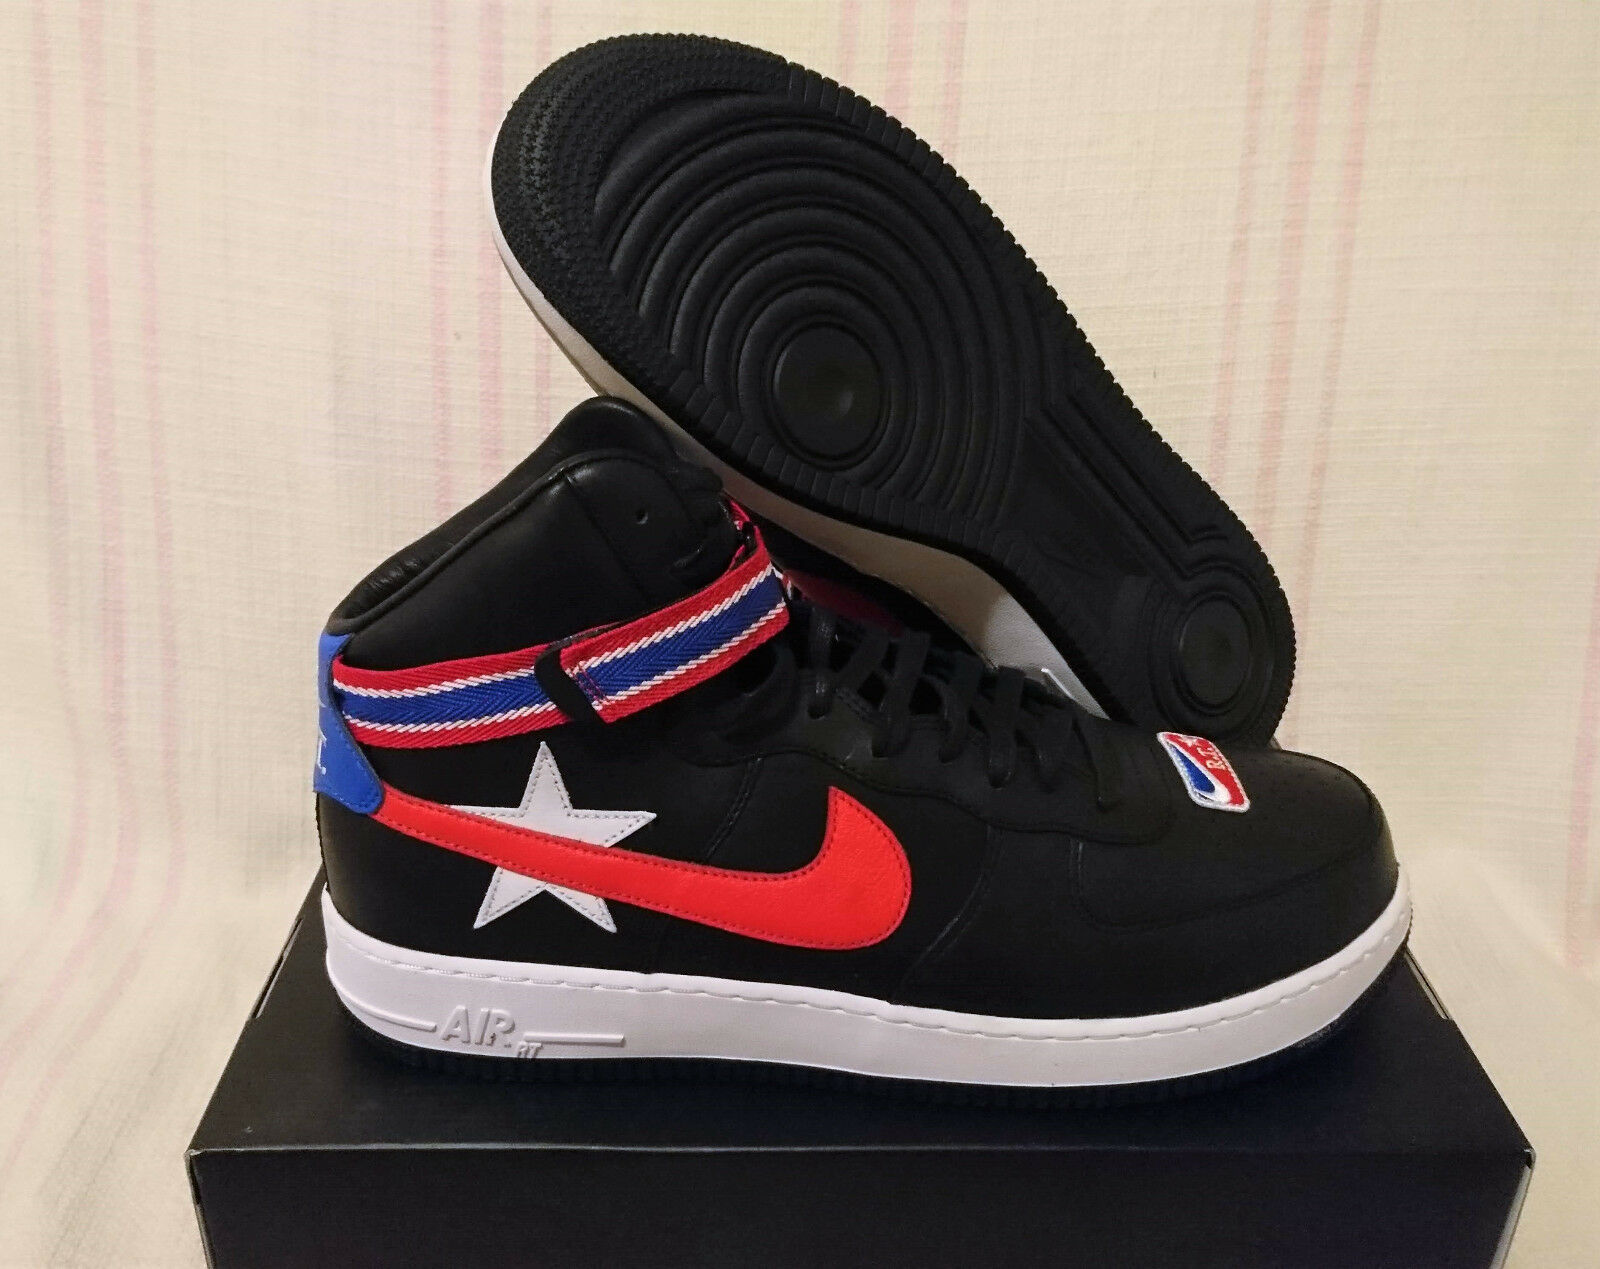 Nike air force di alto x riccardo tisci nt2 nero minotauri aq3366 001 numero 15